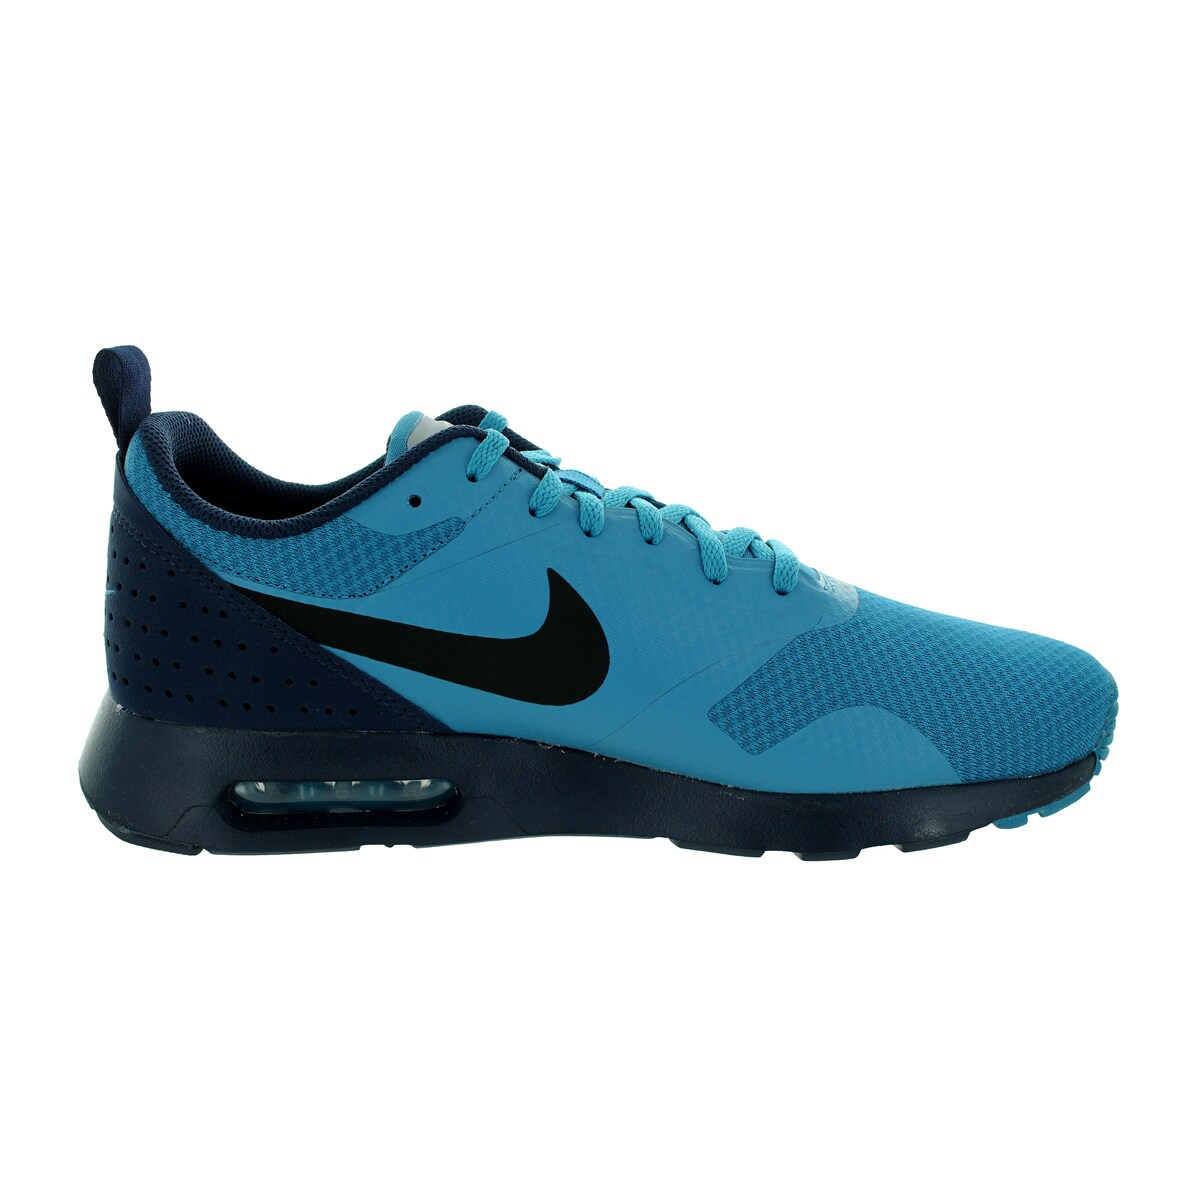 Nike Men's Air Max Tavas Stratus BlueBlackObsidian Running Shoe